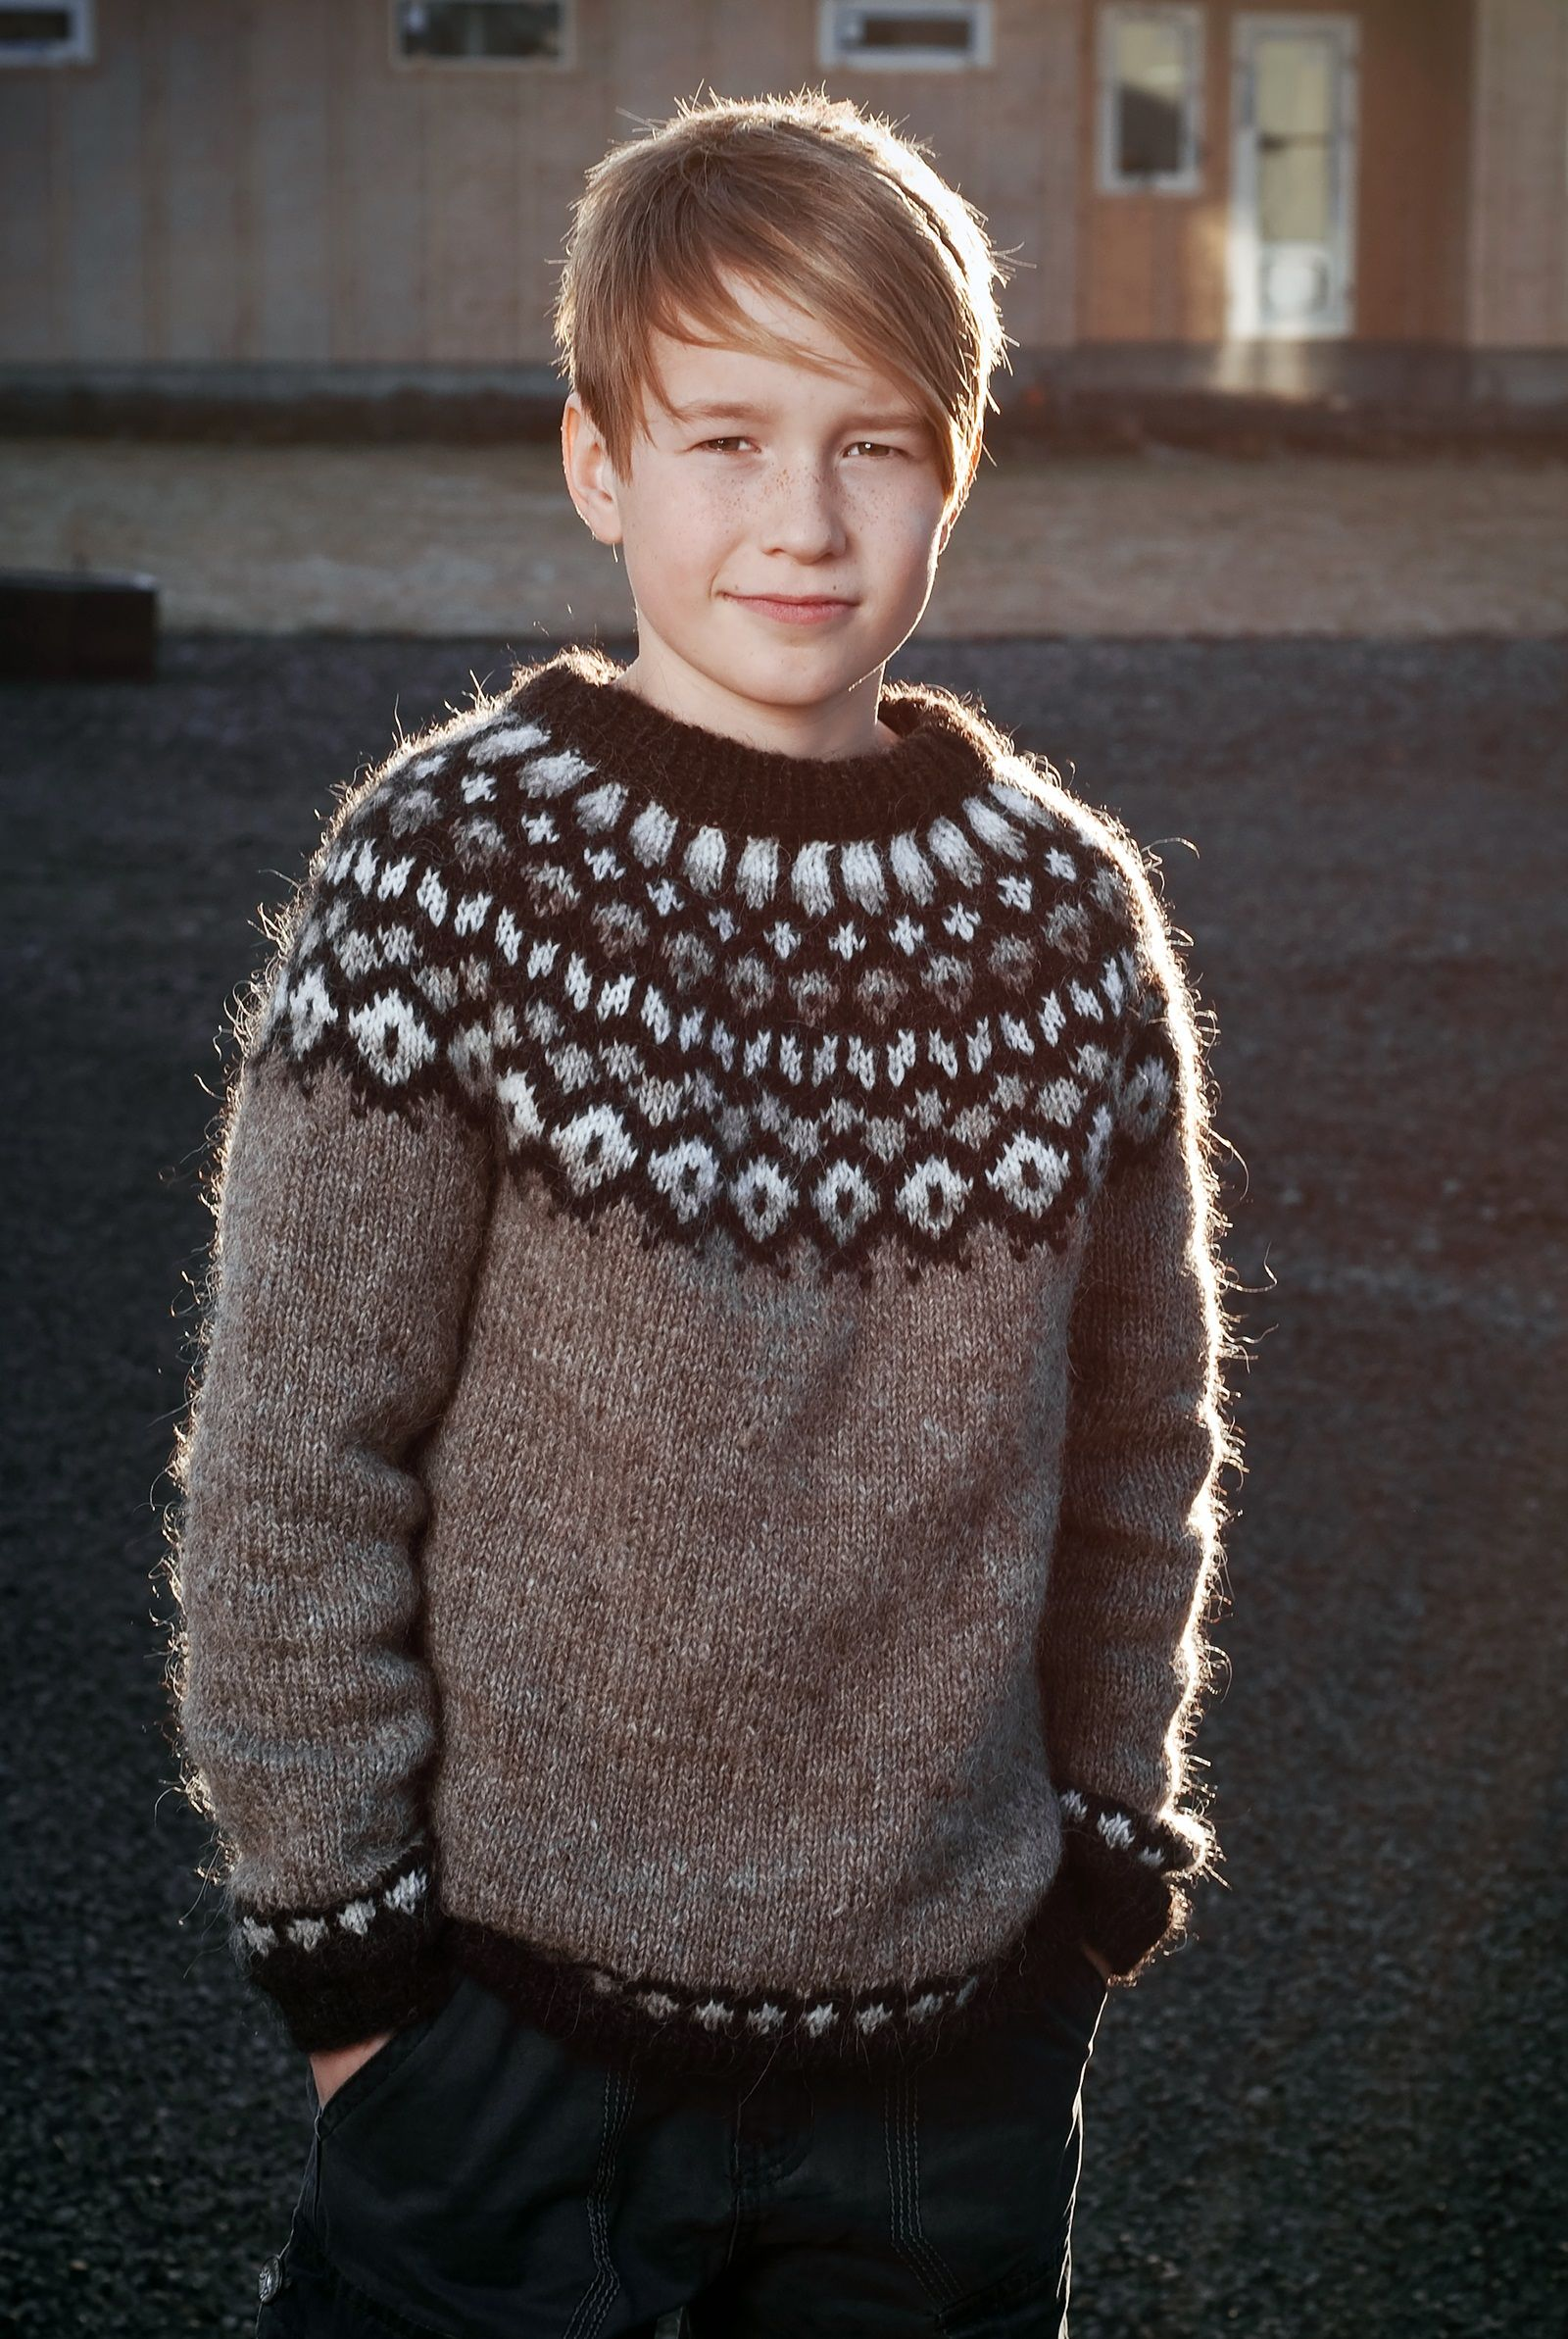 mohair pinterik0 | Jumper knitting pattern, Sweater ...